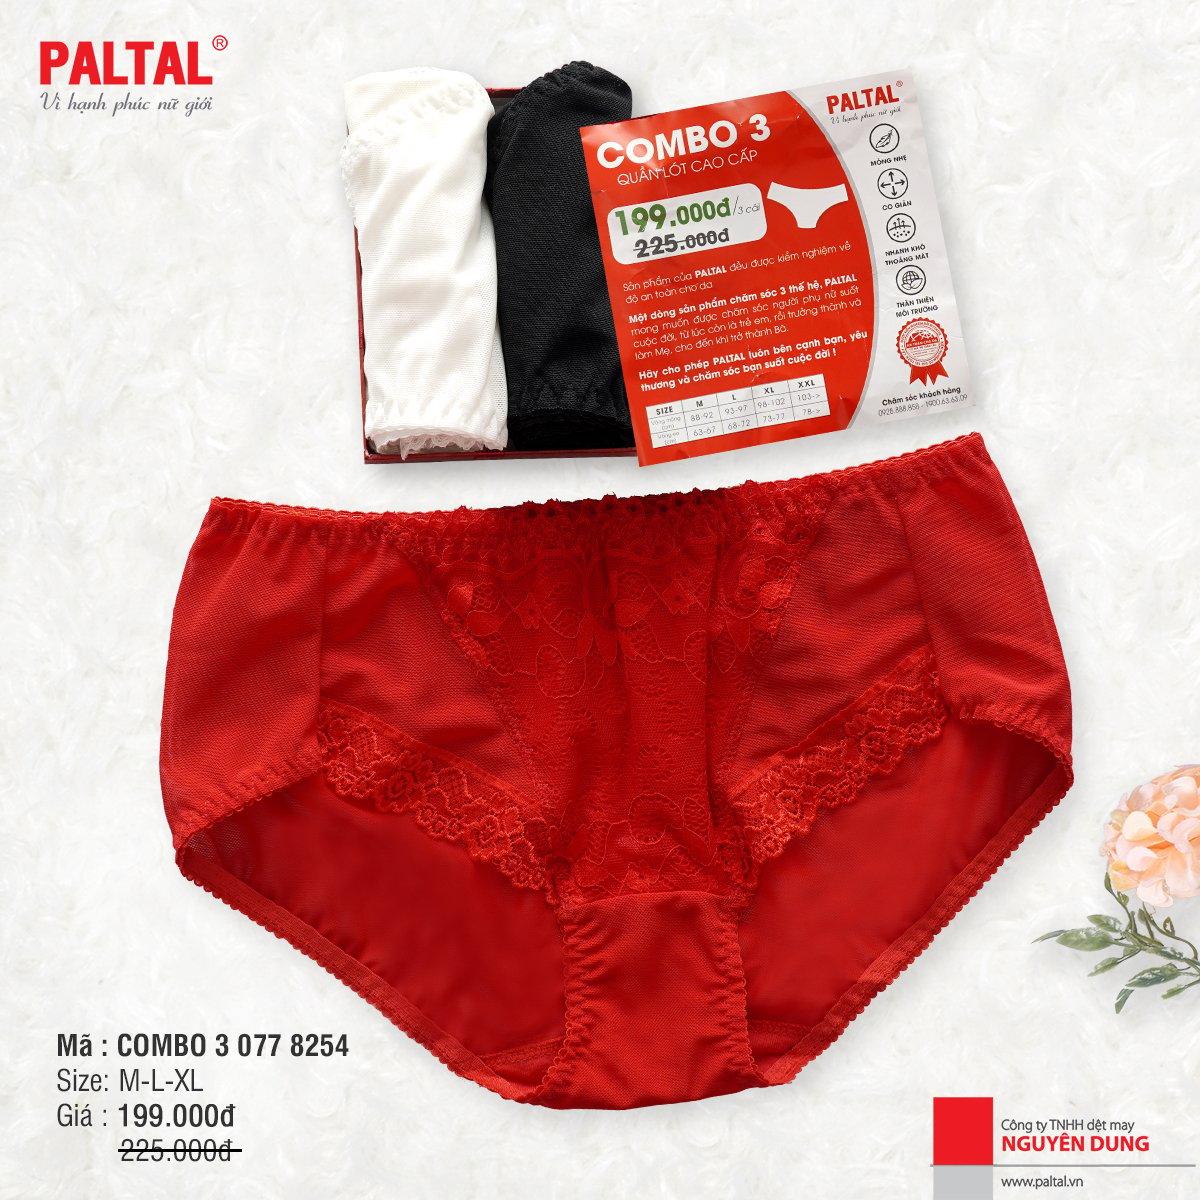 Combo 3 quần lót cao cấp Paltal ql 077p 8254